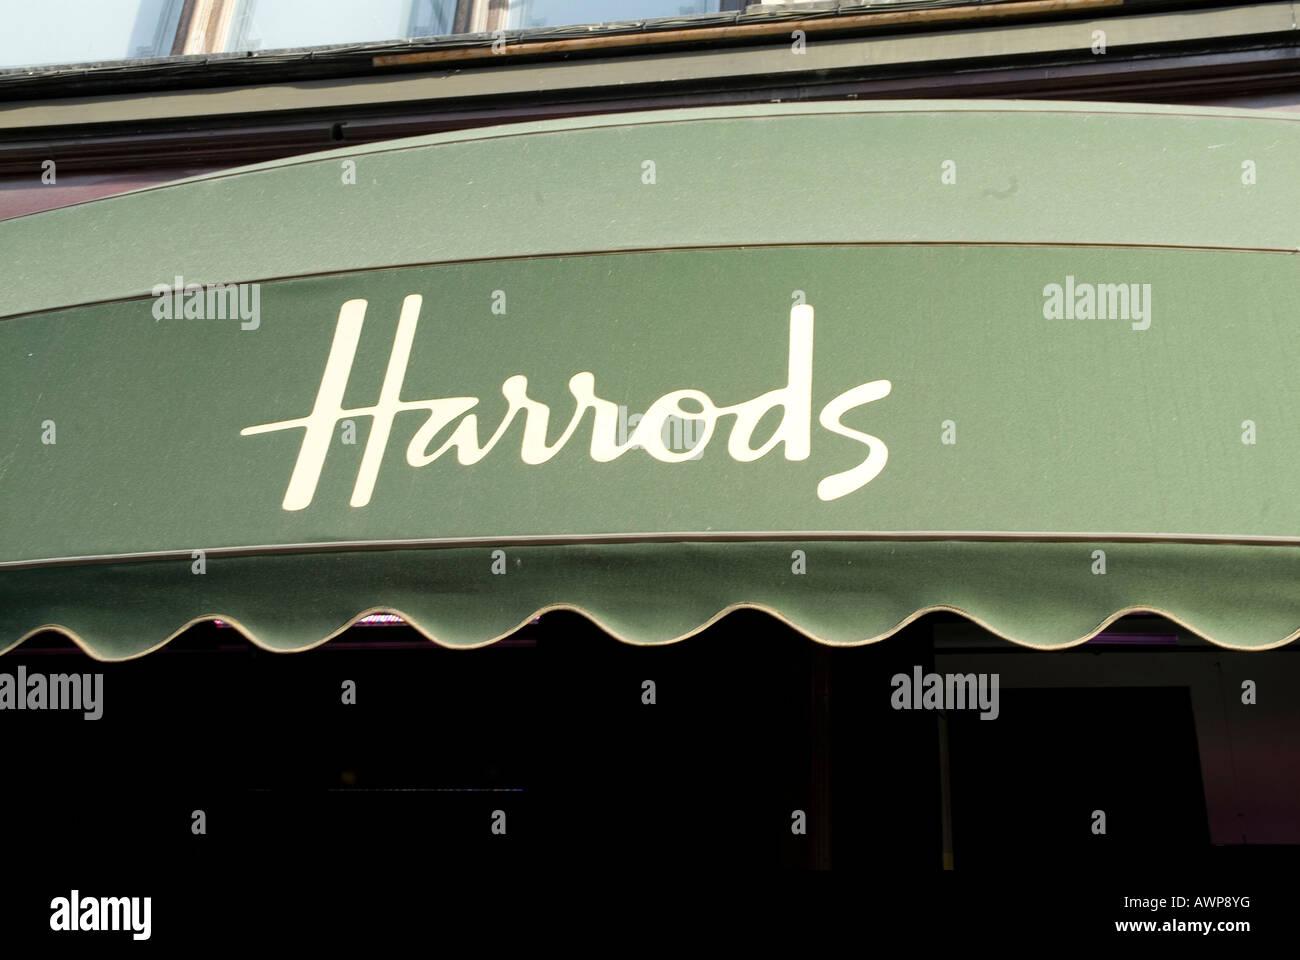 Harrods - Stock Image